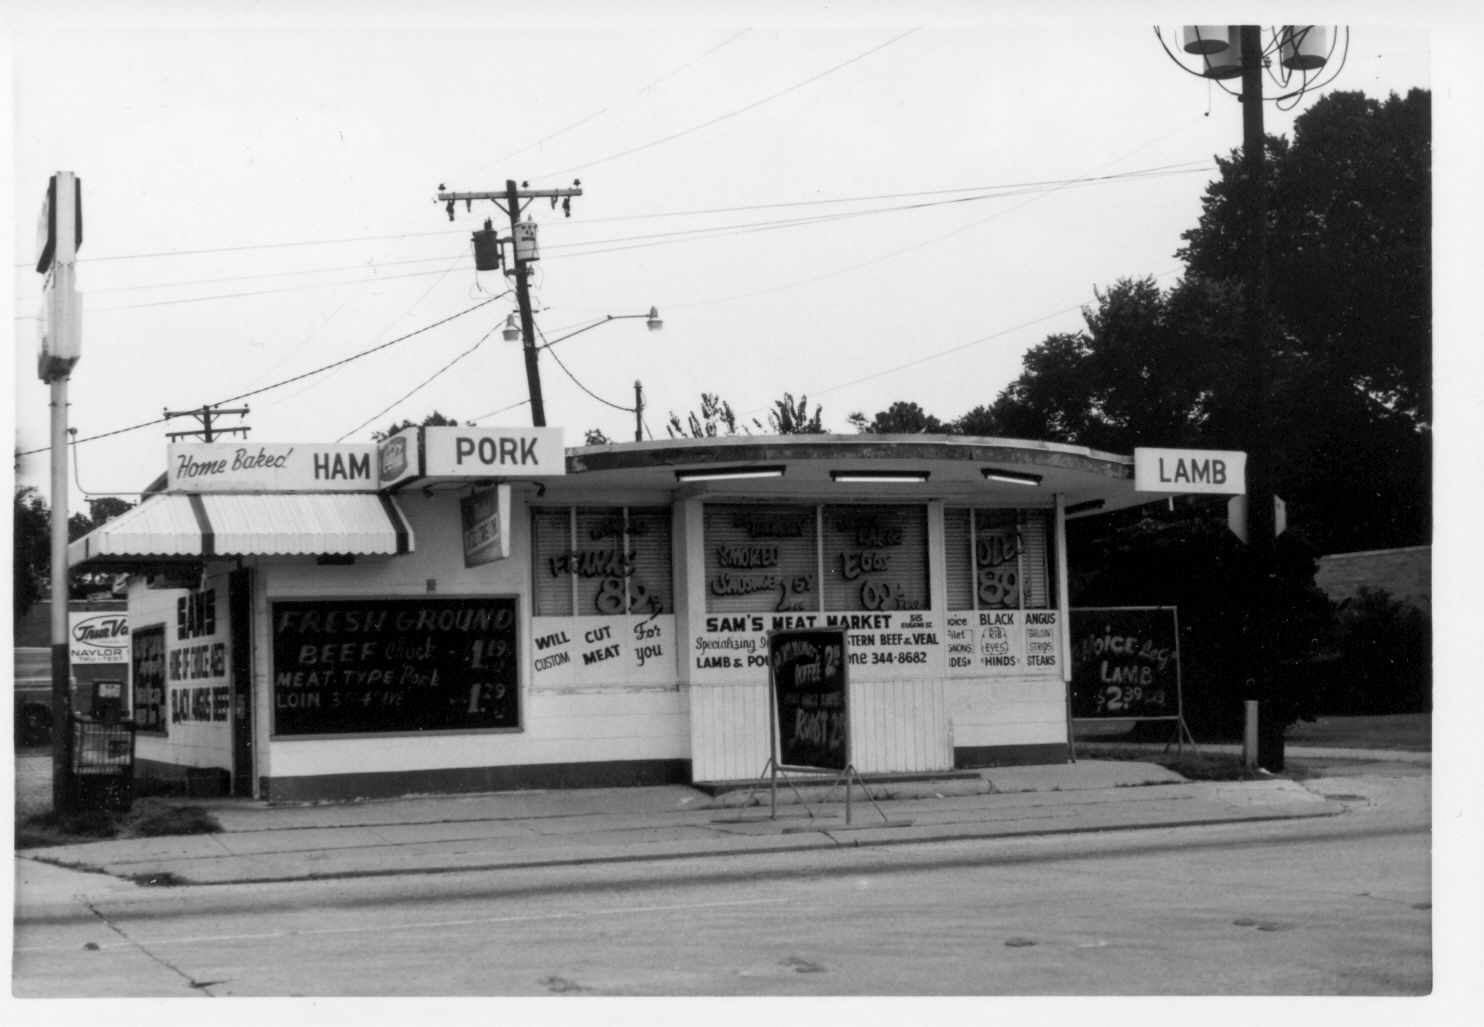 Sam's Meat Market, Government Street, Baton Rouge